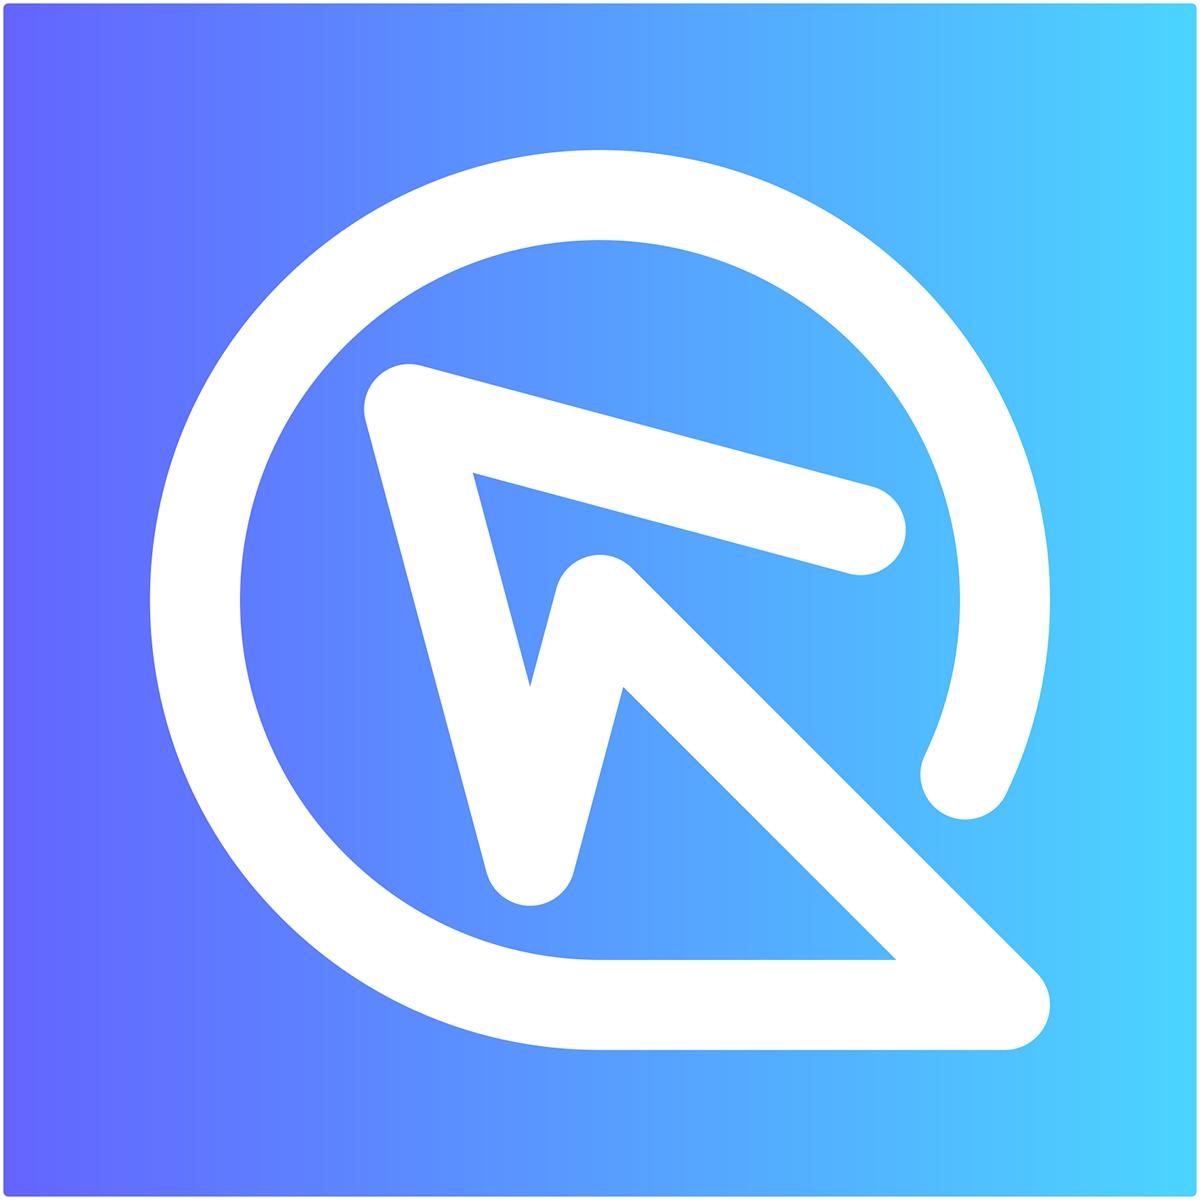 Shopify Product Recommendation app by Revenuehunt